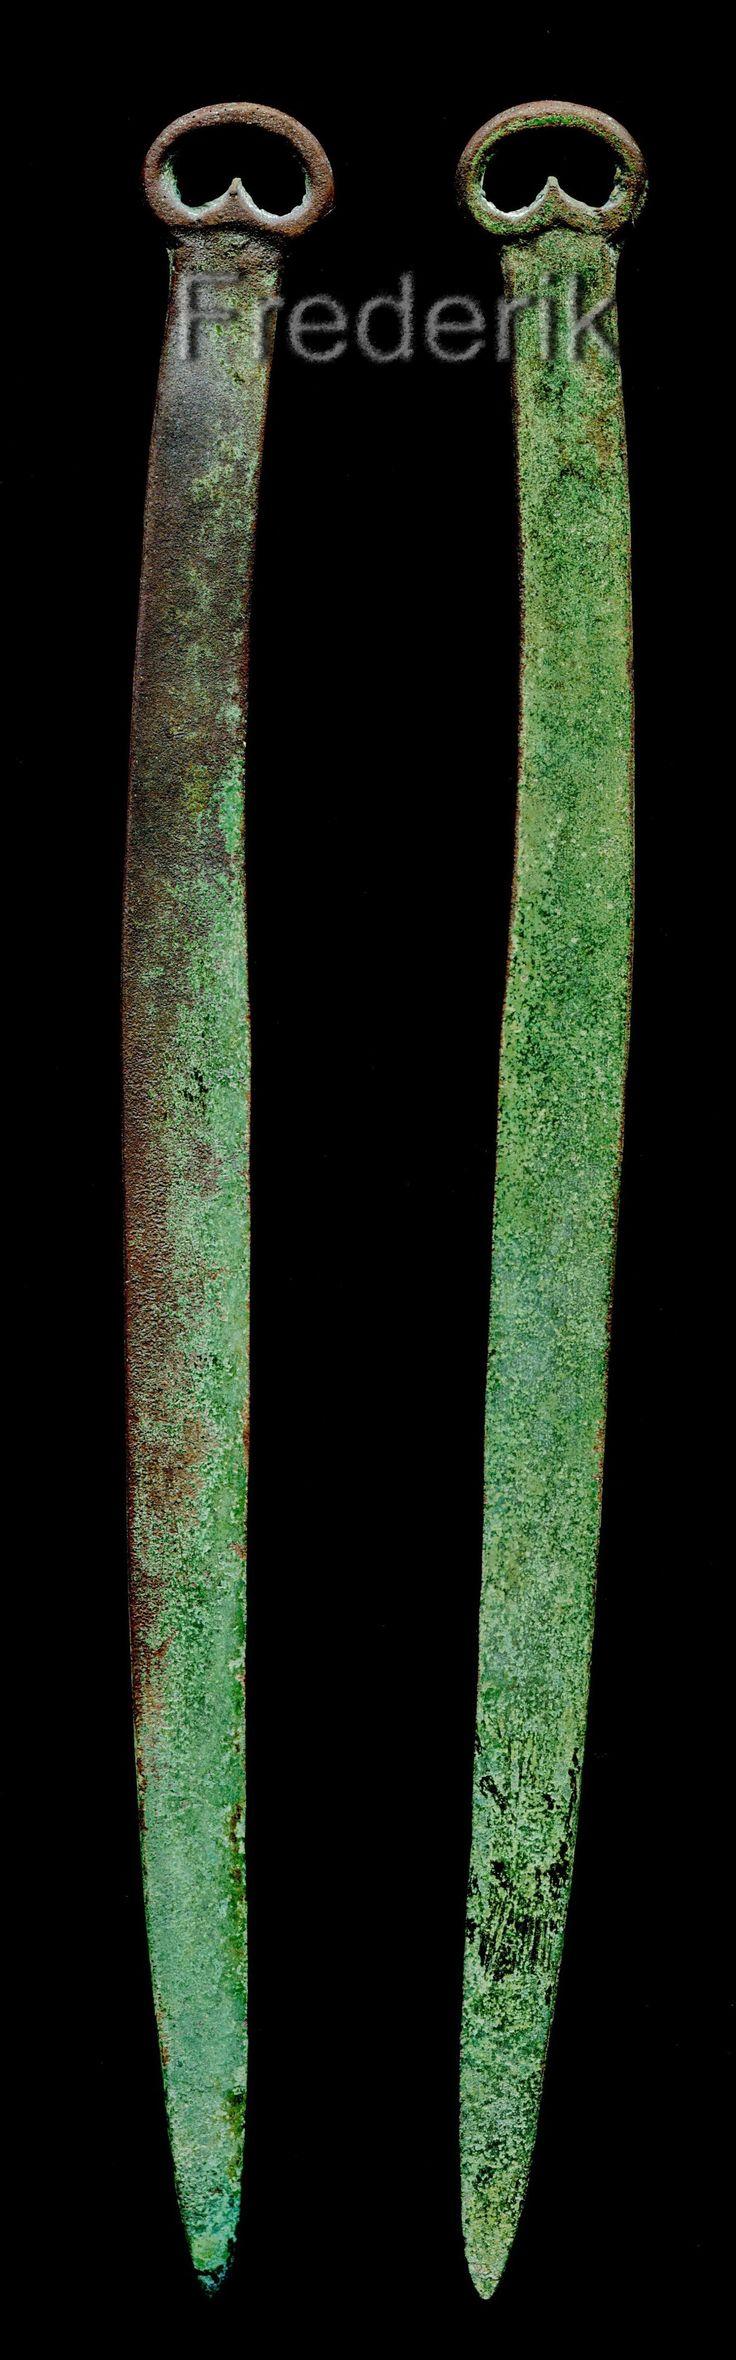 bronze Knife-The Bronze Age-Tagar culture-Scythians Siberia.